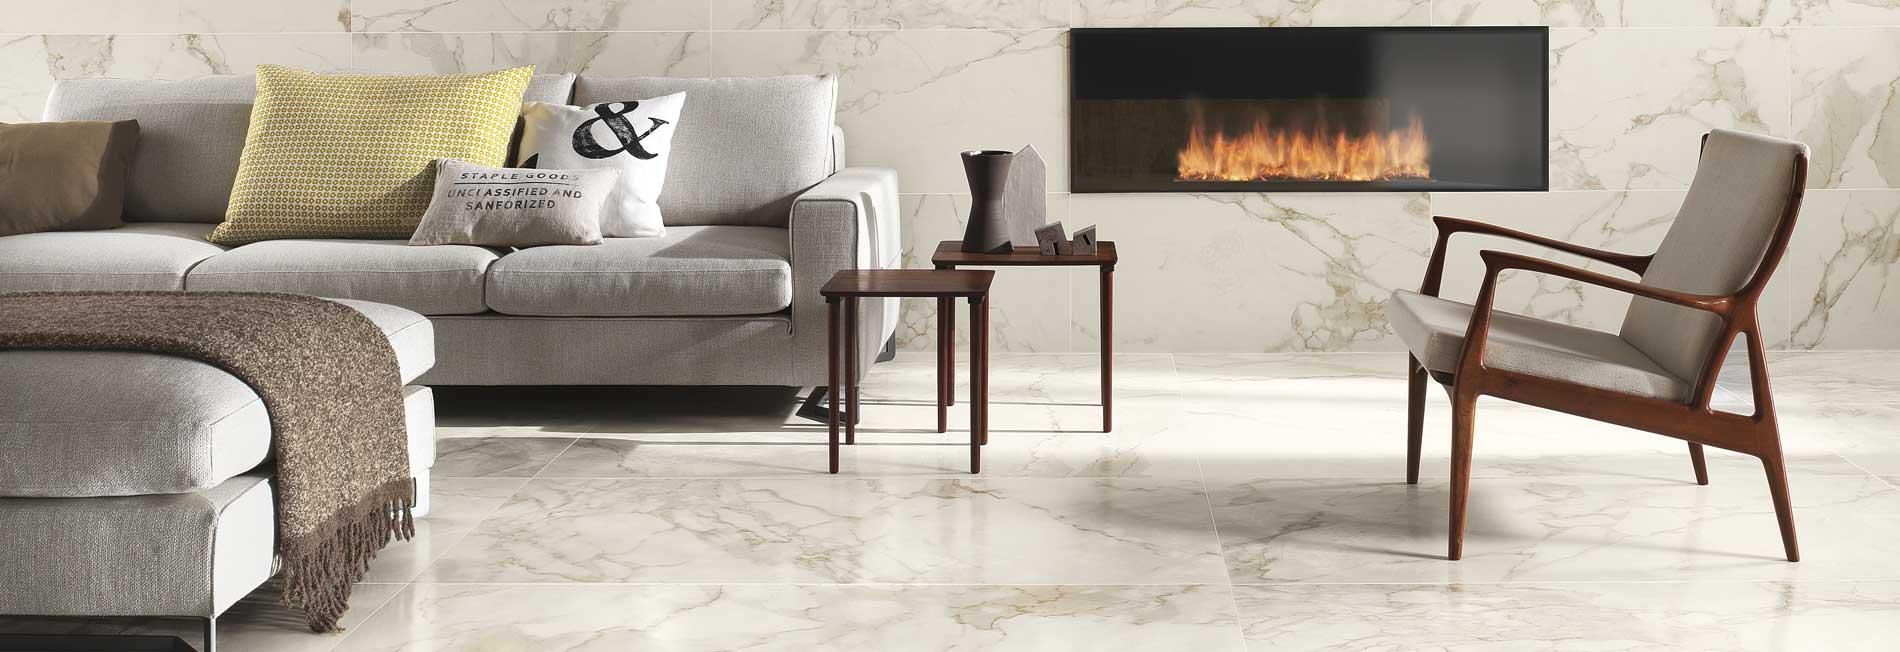 banner-roma-floor-wall-tile-marble-2